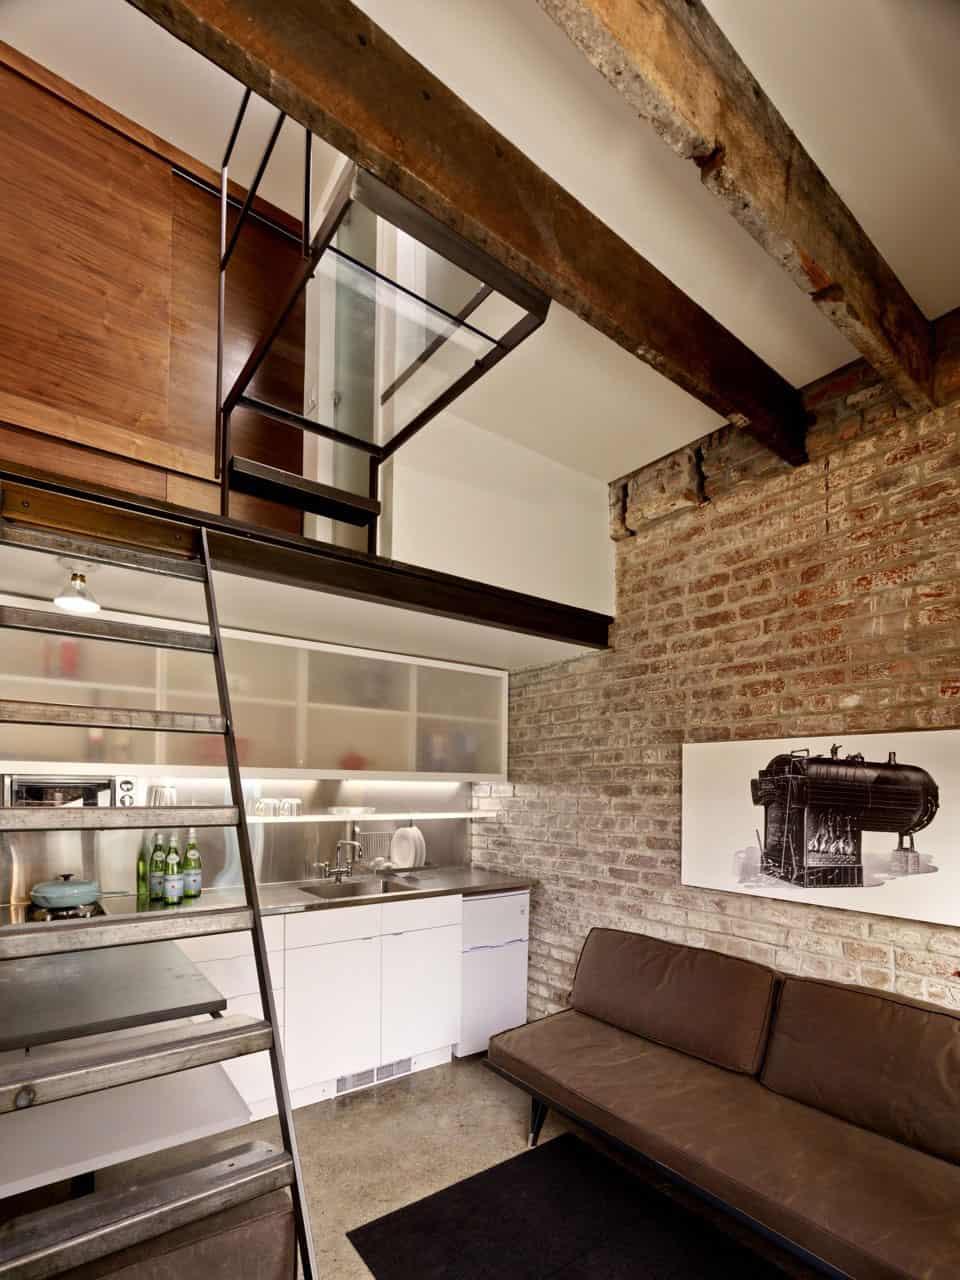 Brick House by Christi Azevedo (4)